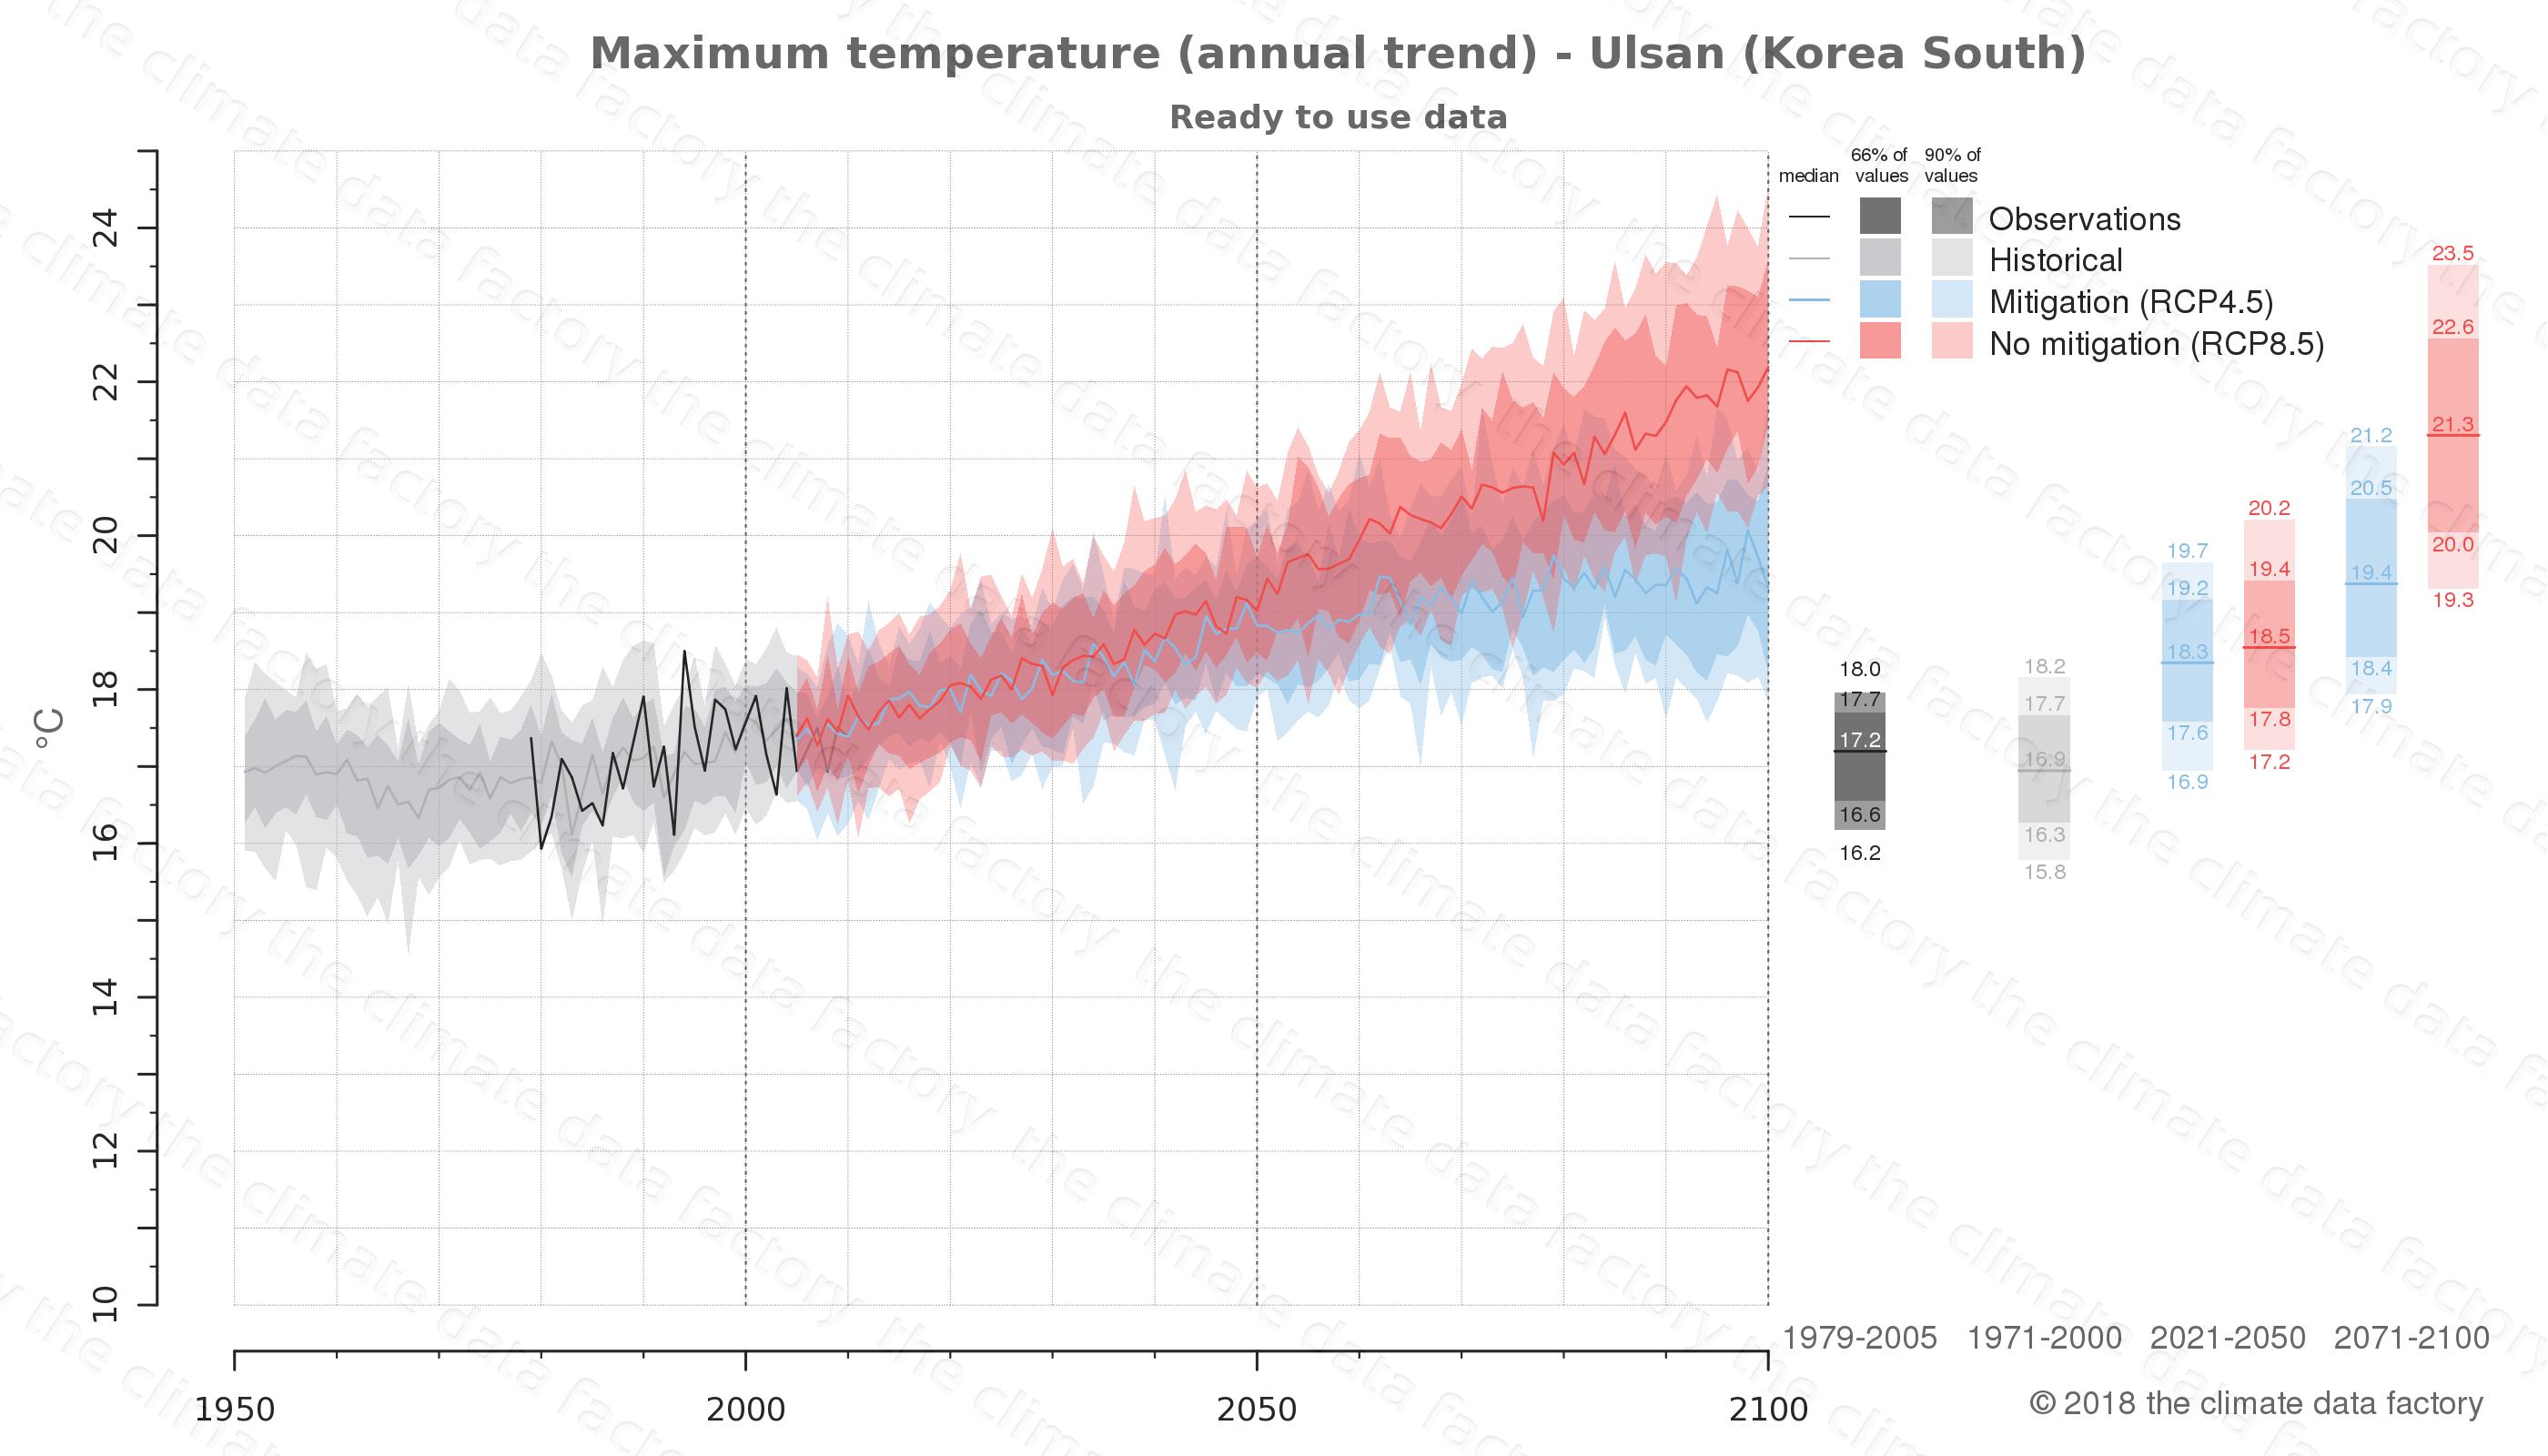 climate change data policy adaptation climate graph city data maximum-temperature ulsan south korea